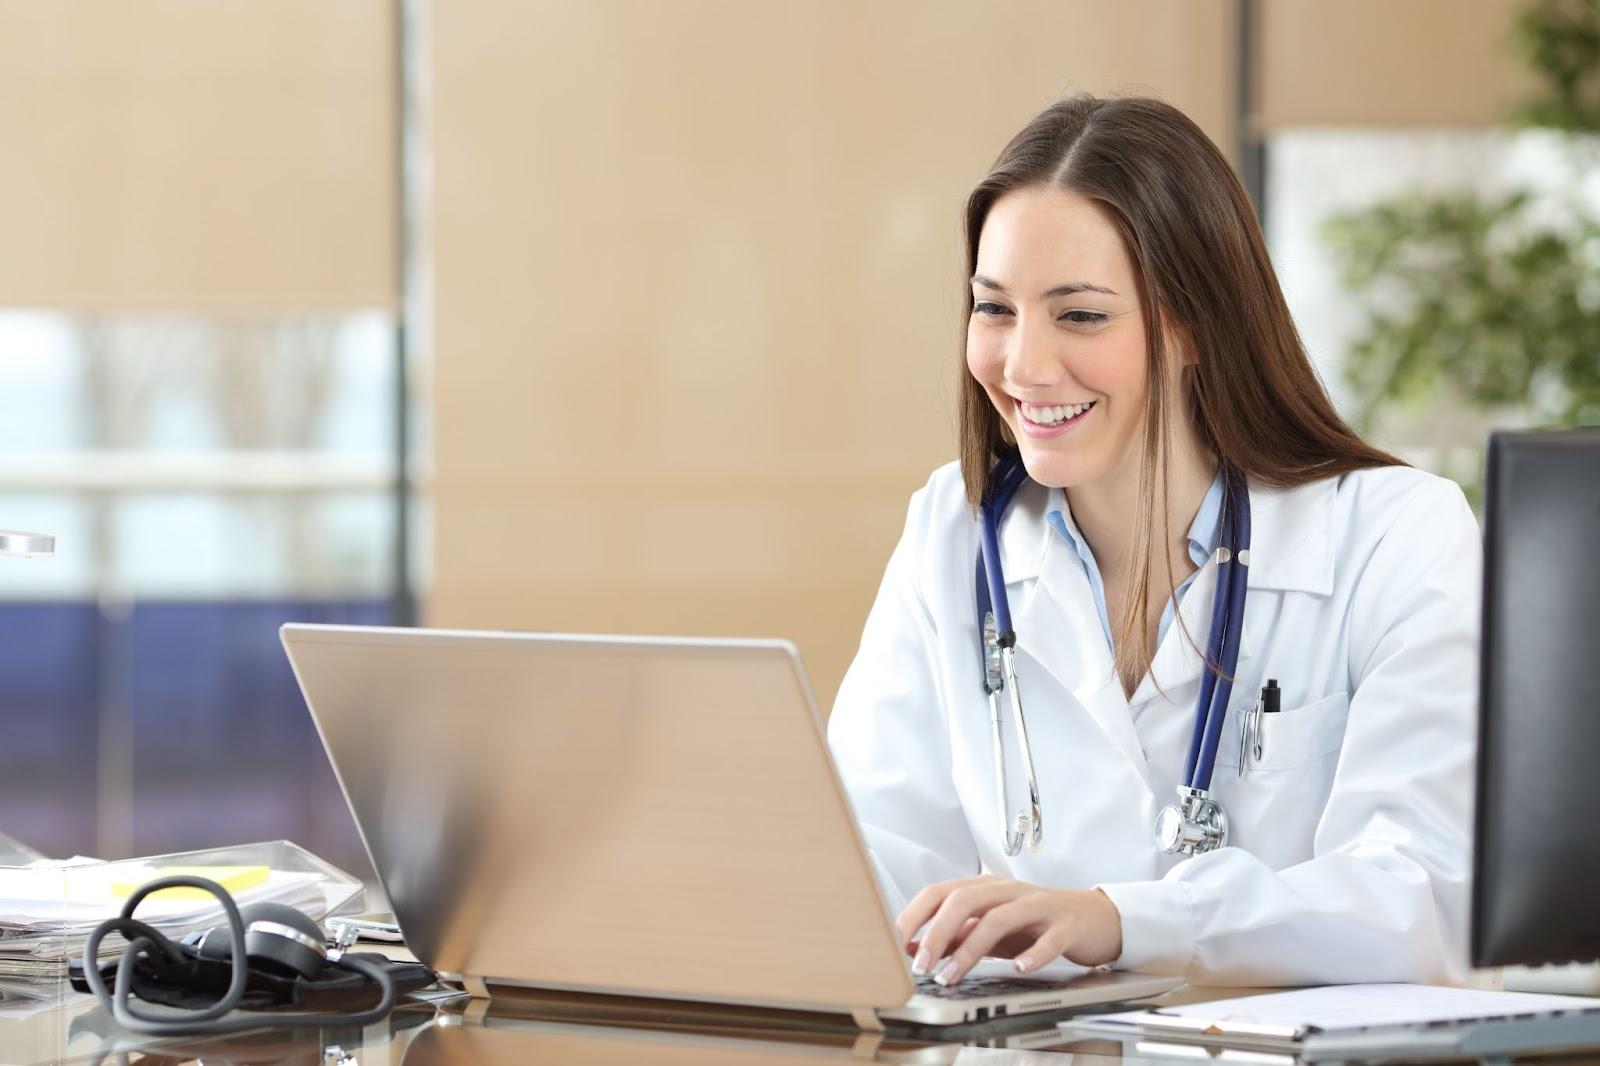 A licensed medical professional undergoing virtual medical aesthetics training